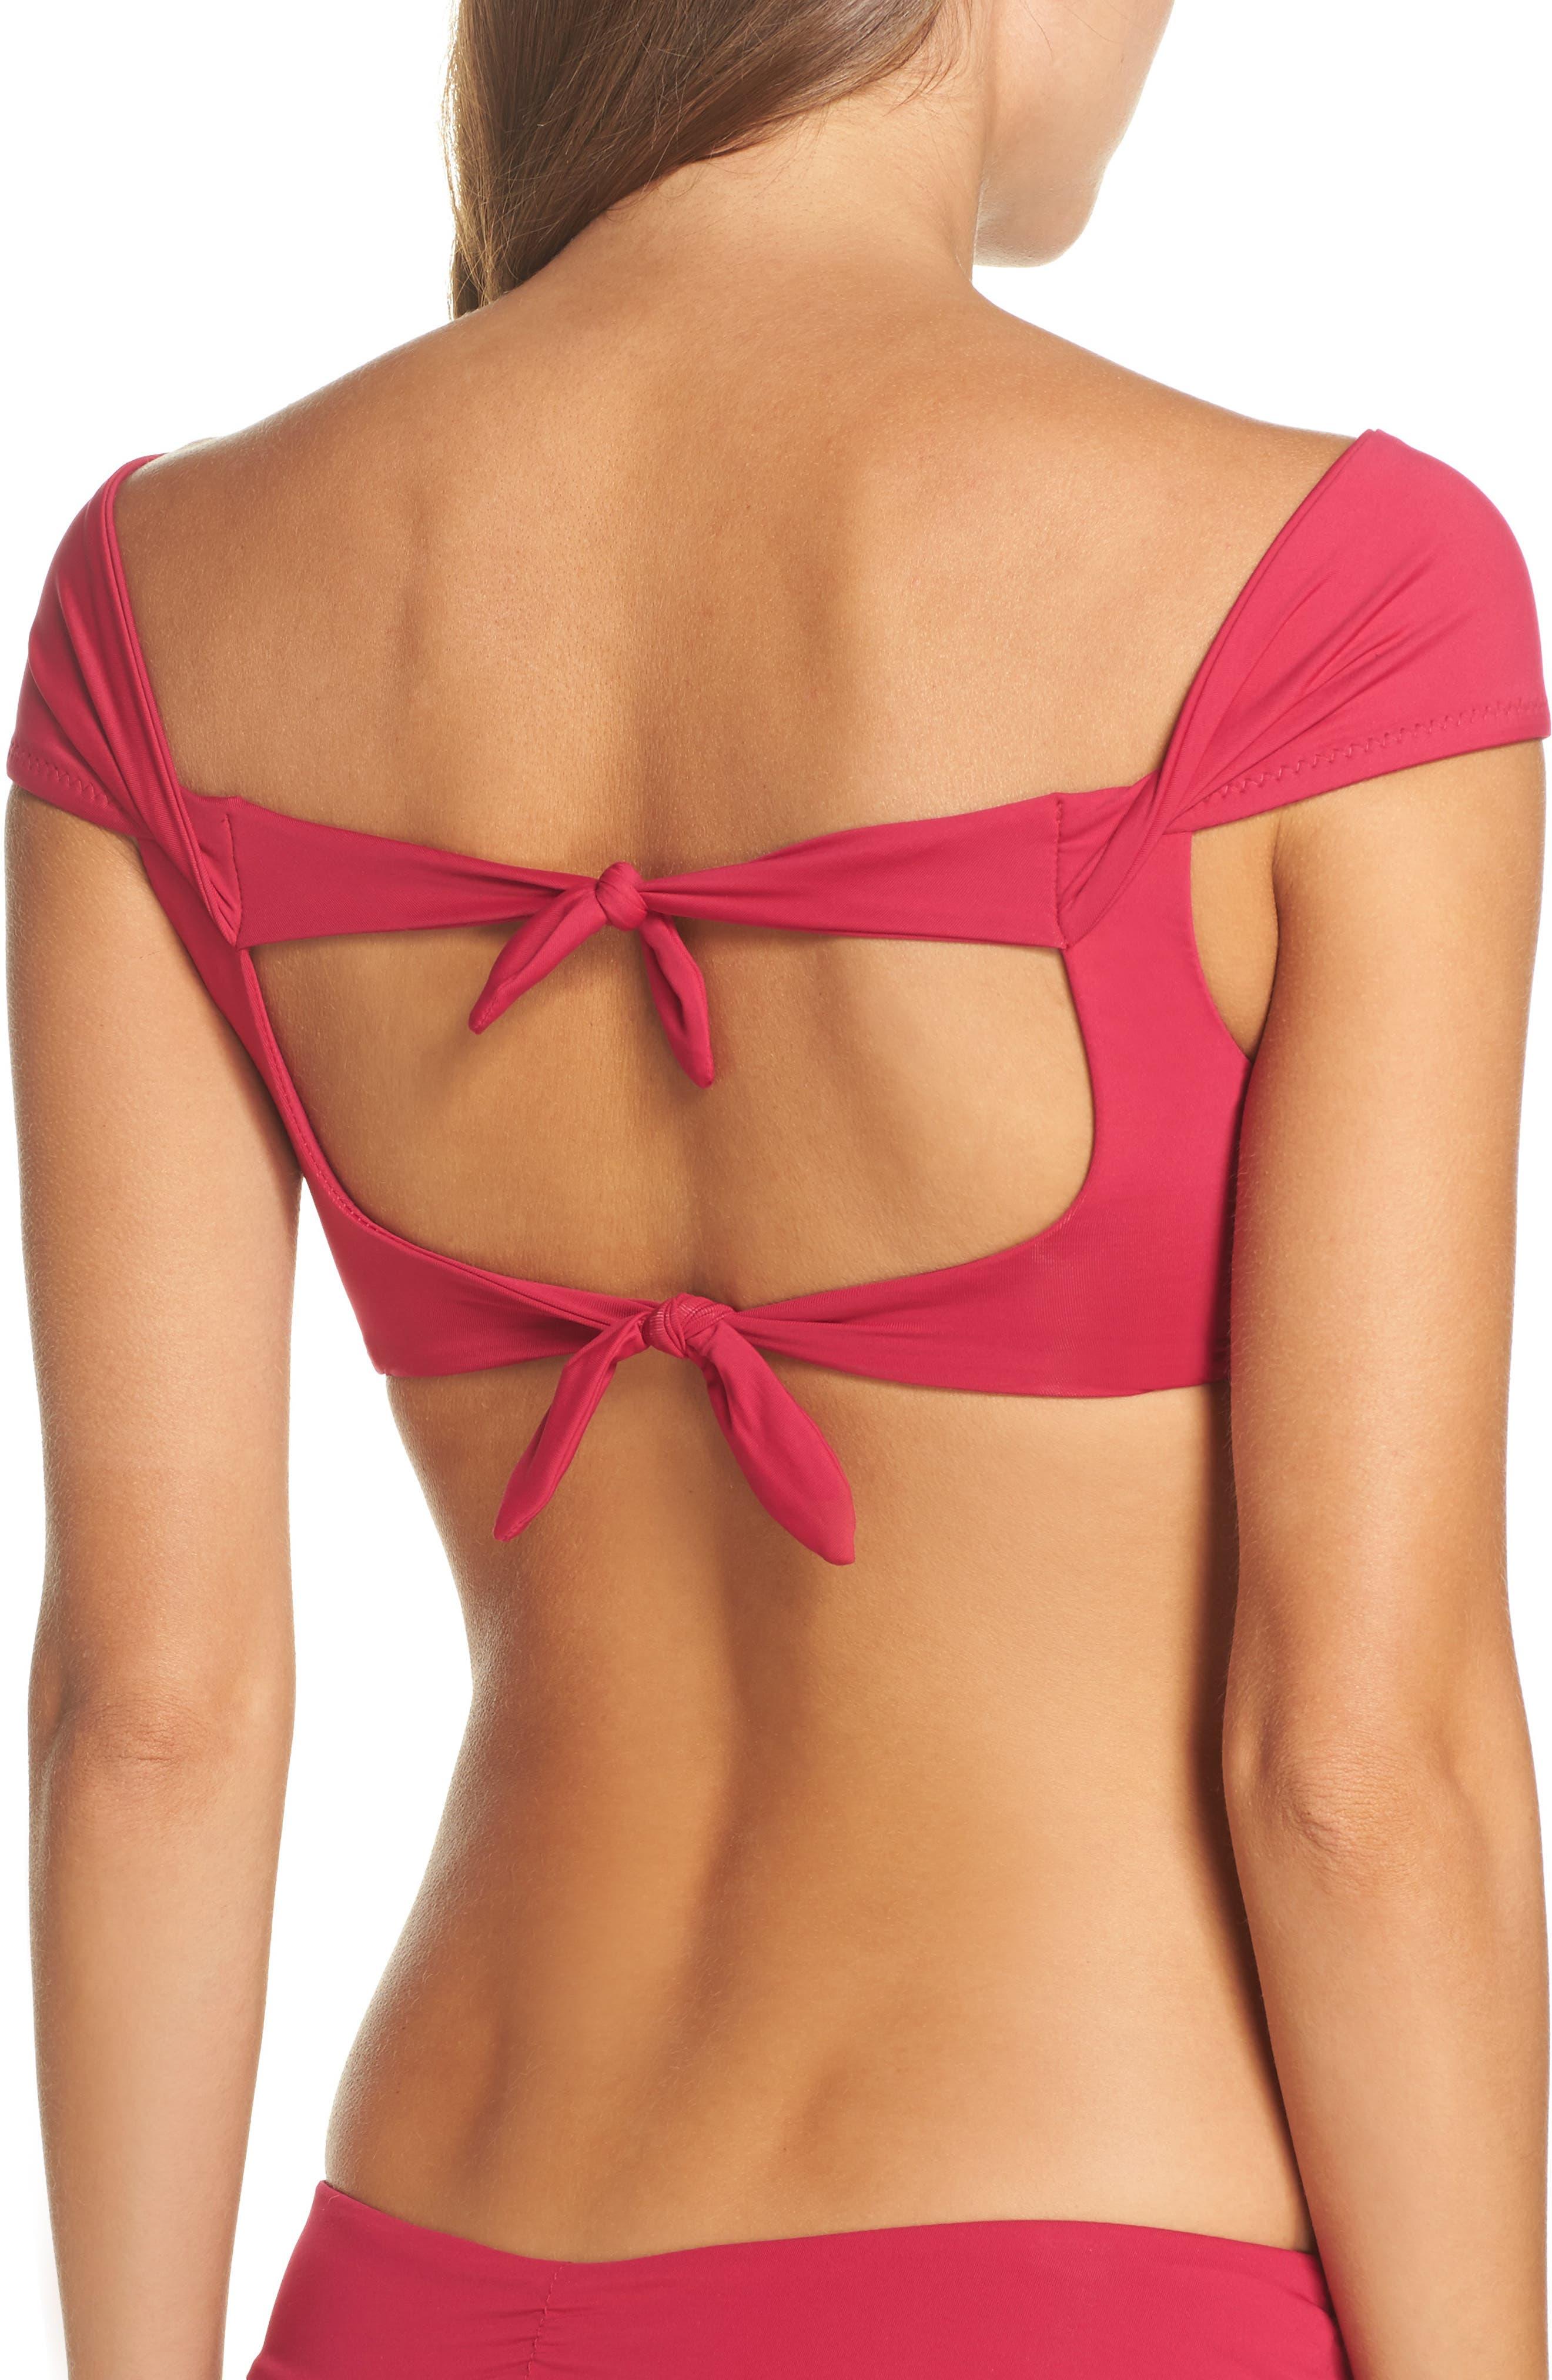 Socialite Off-the-Shoulder Bikini Top,                             Alternate thumbnail 4, color,